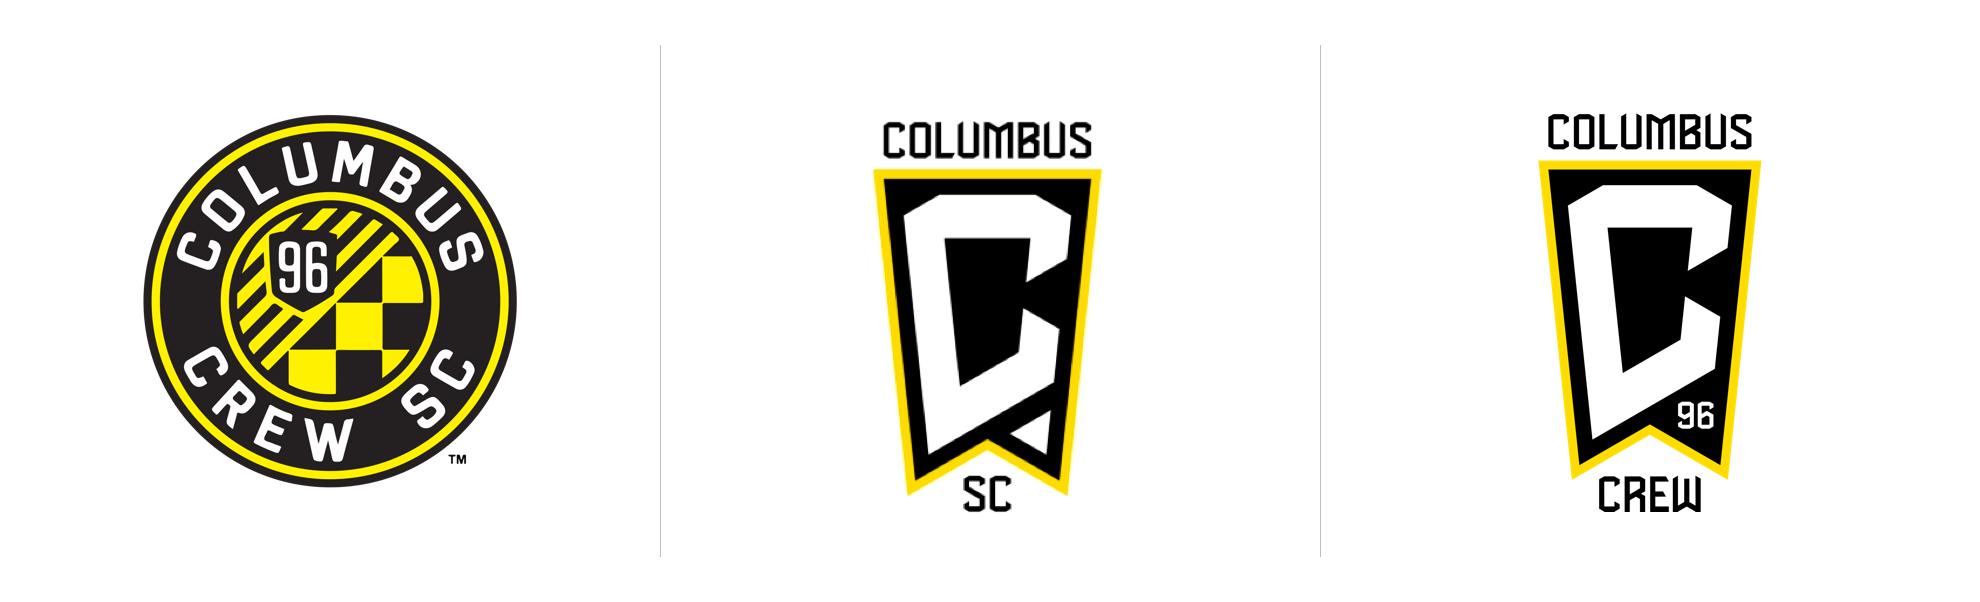 Columbus Crew znowym logo